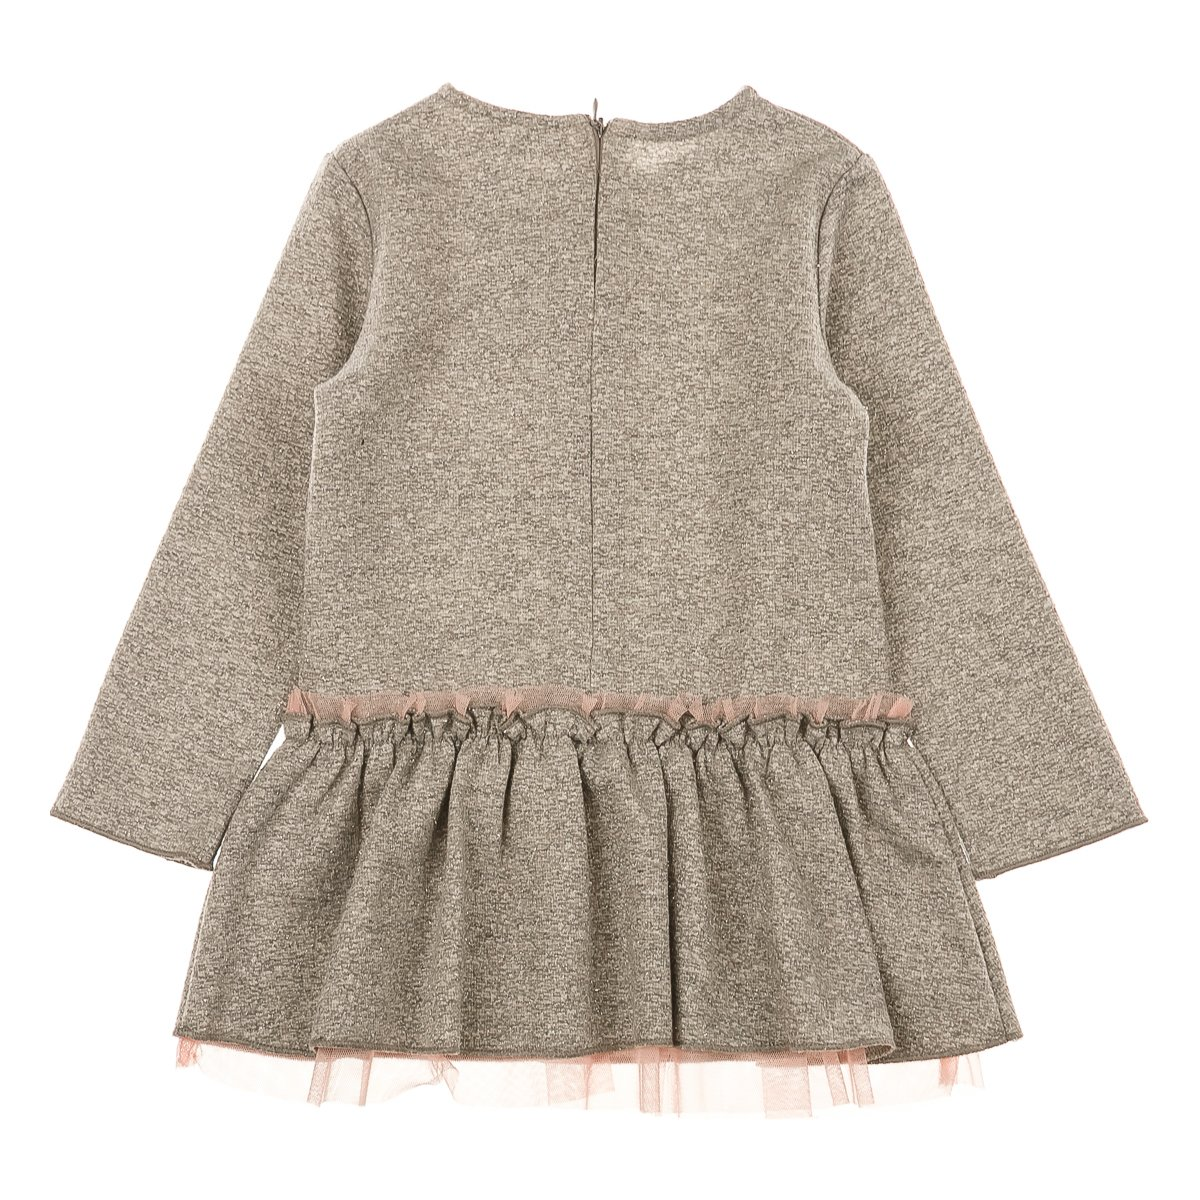 Купить Платья, сарафаны, юбки, Платье BluKids Love&Flowers, р. 74 5479458 ТМ: BluKids, серый